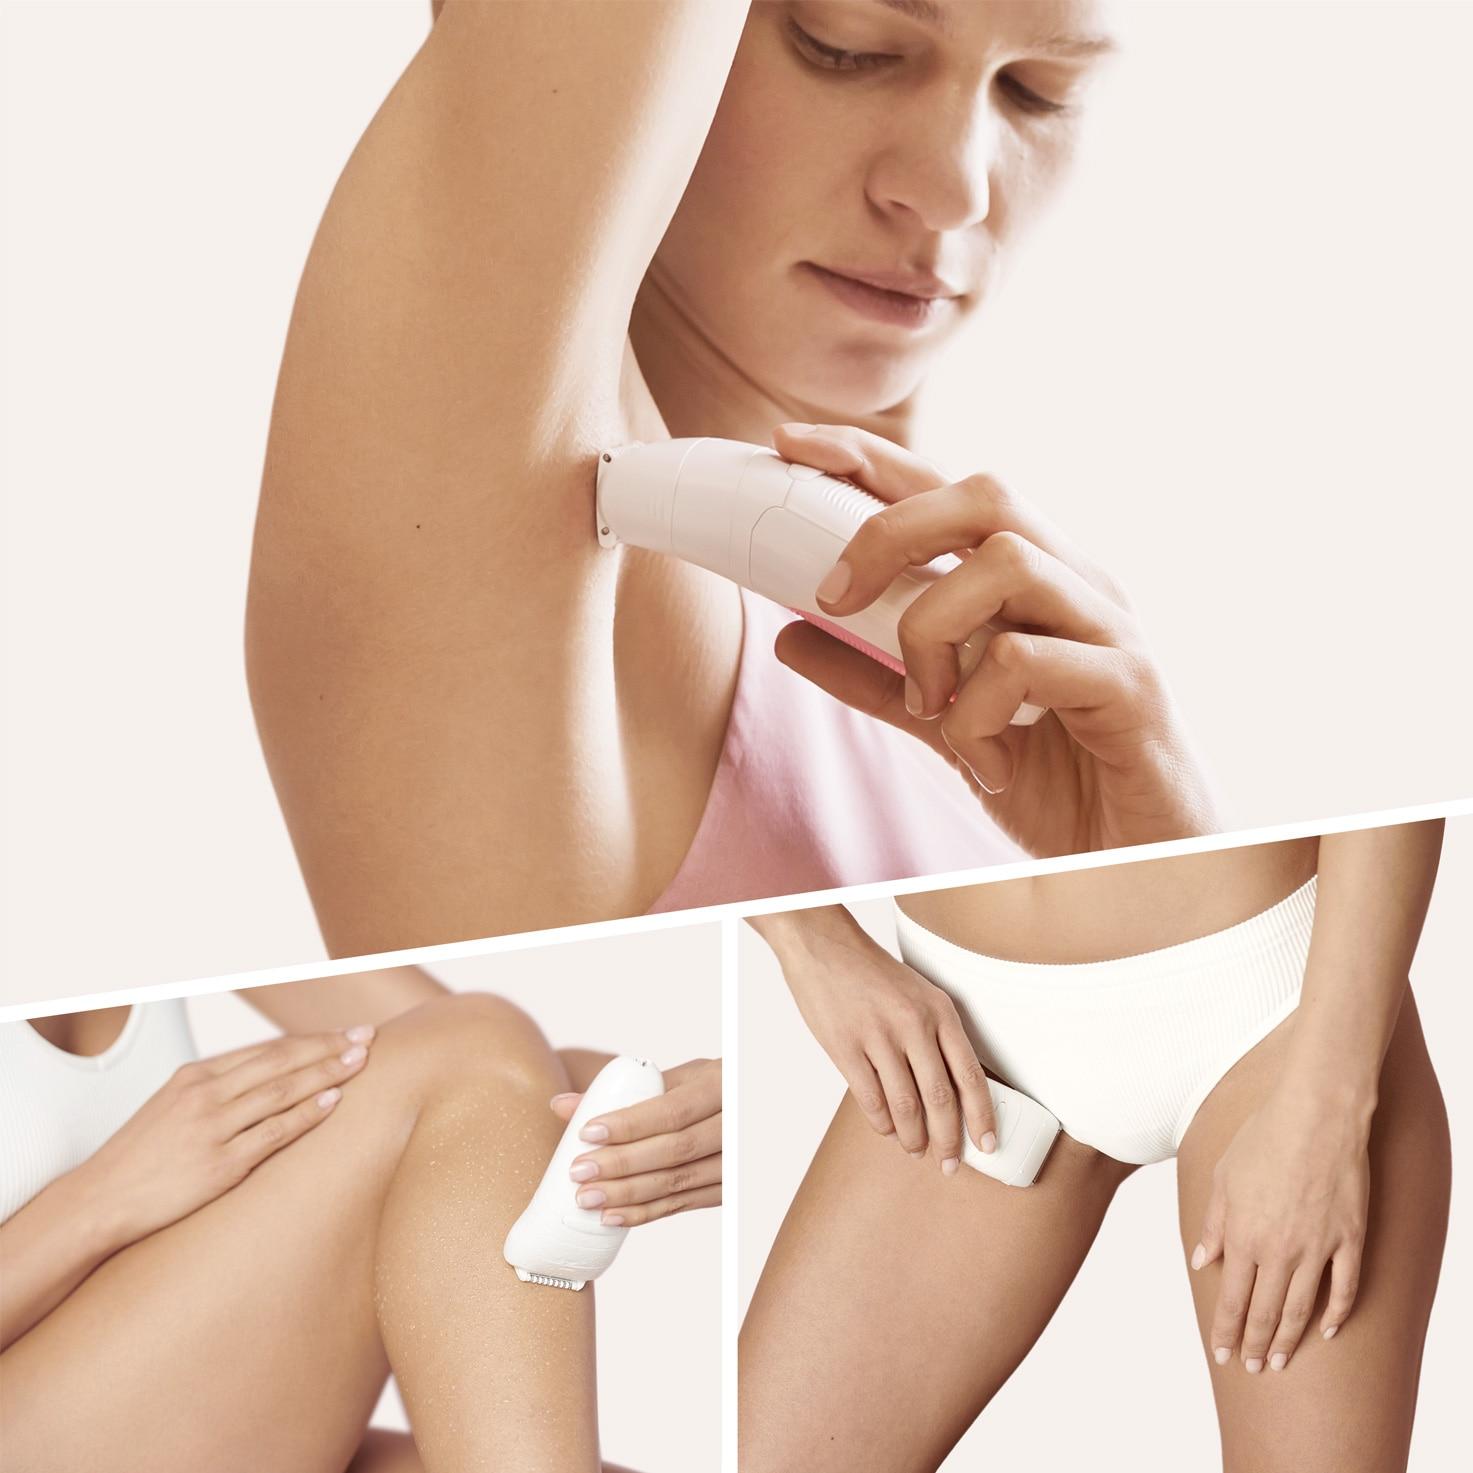 Braun Silk-épil 5-620 epilator. Wet & Dry epilator. Man / Woman Shaving Bikini Depilatory Legs Body enlarge